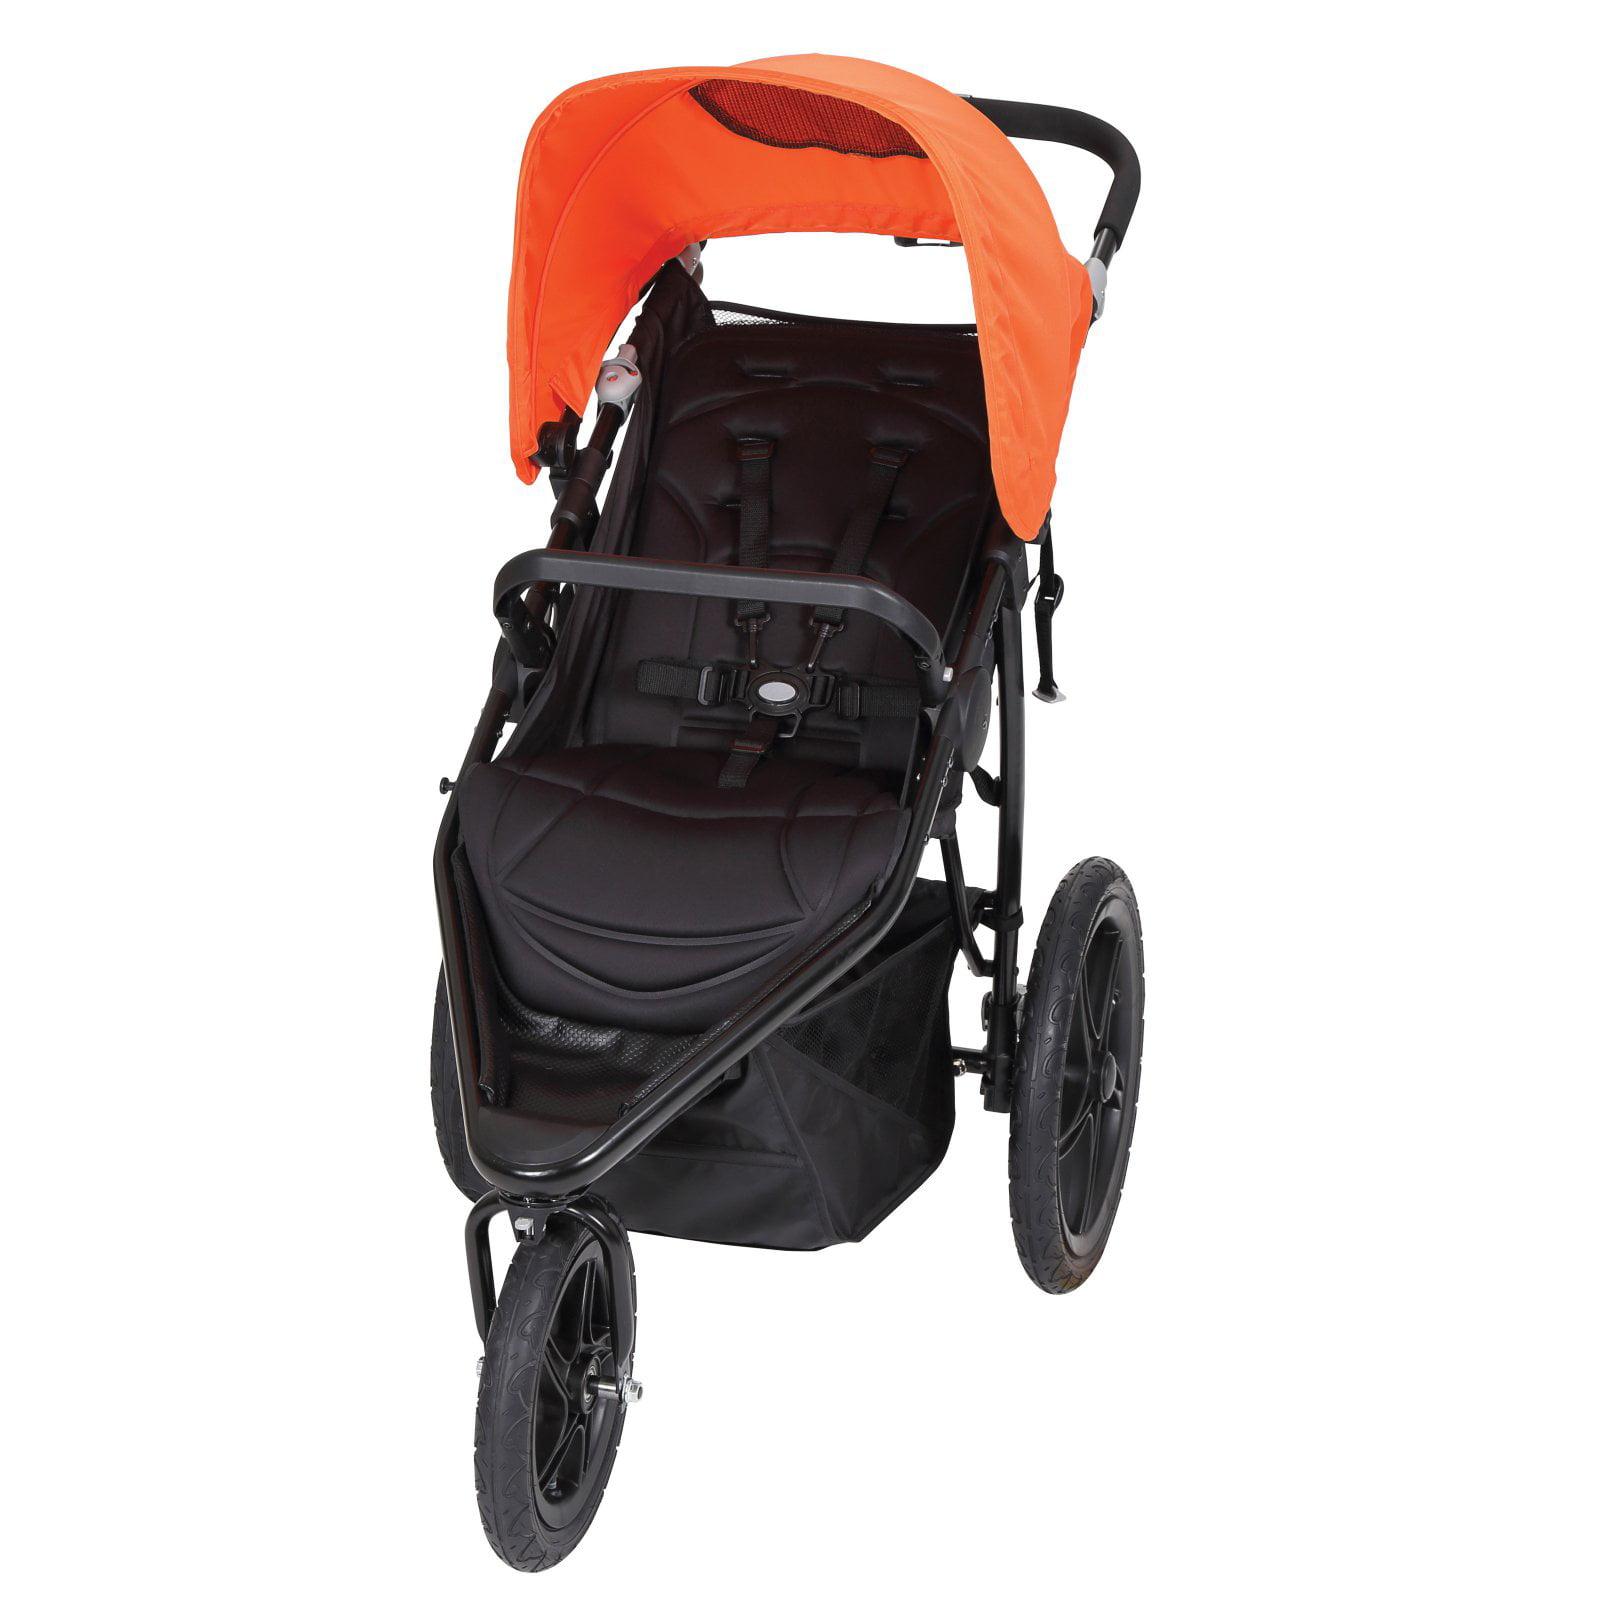 Baby Trend Stealth Jogging Stroller, Poppy